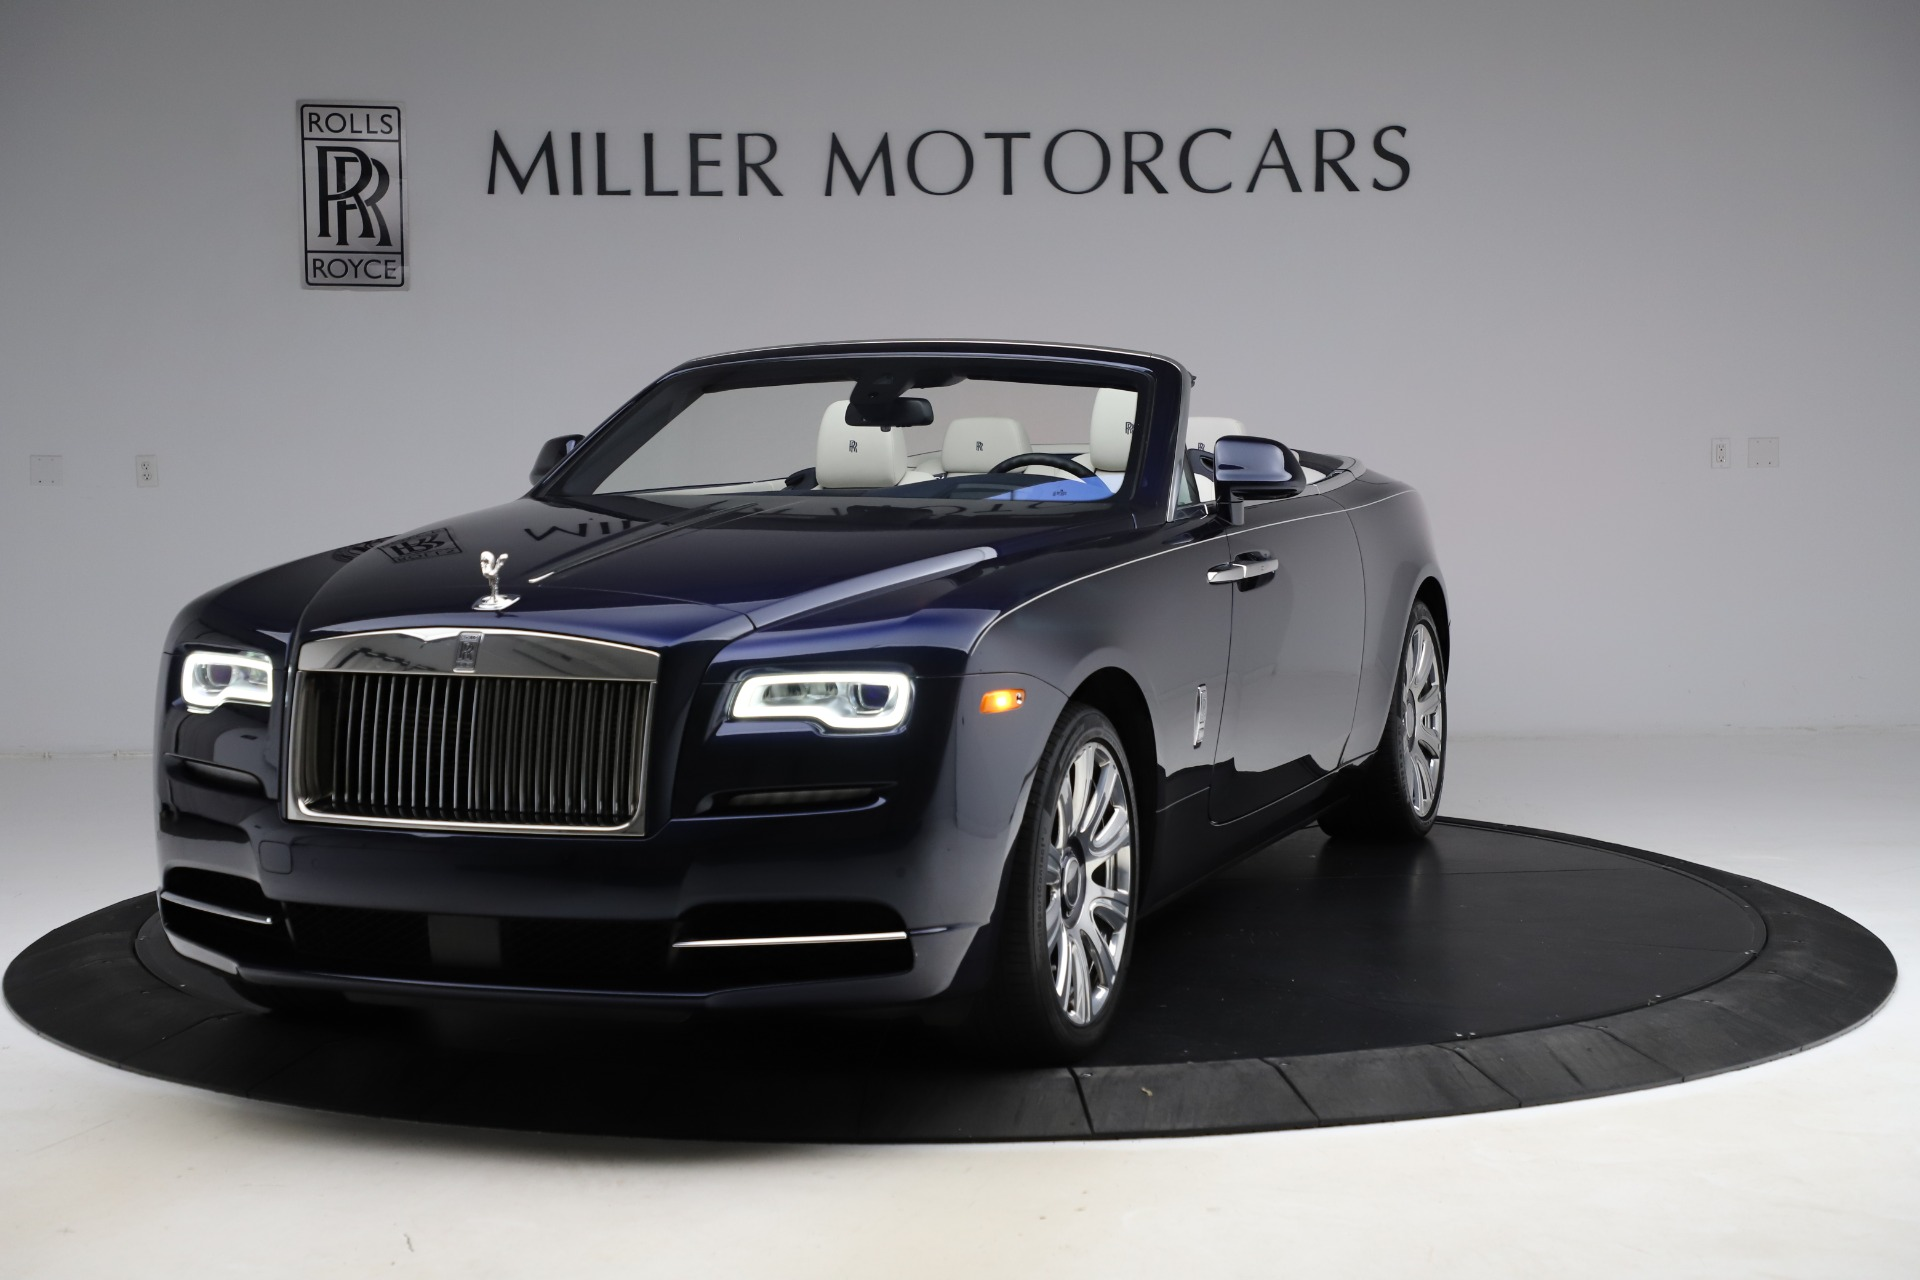 Used 2016 Rolls-Royce Dawn for sale $243,900 at Rolls-Royce Motor Cars Greenwich in Greenwich CT 06830 1